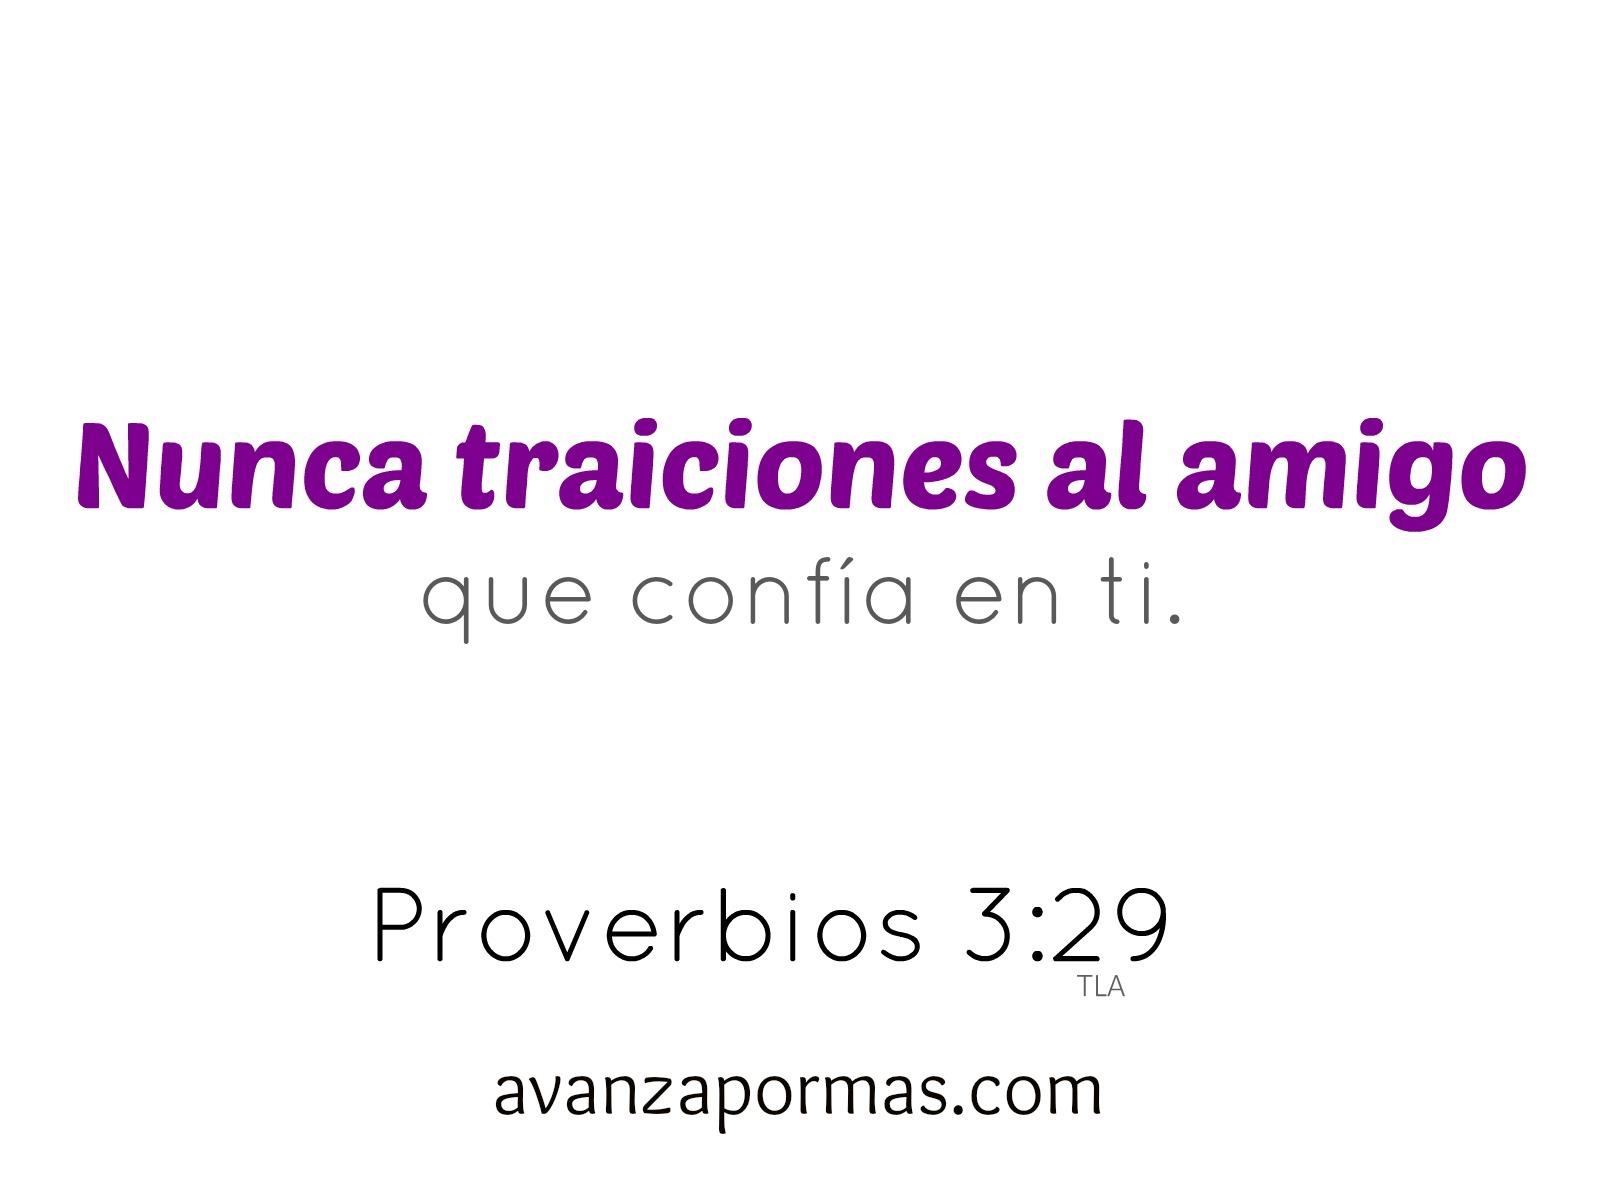 proverbios 8